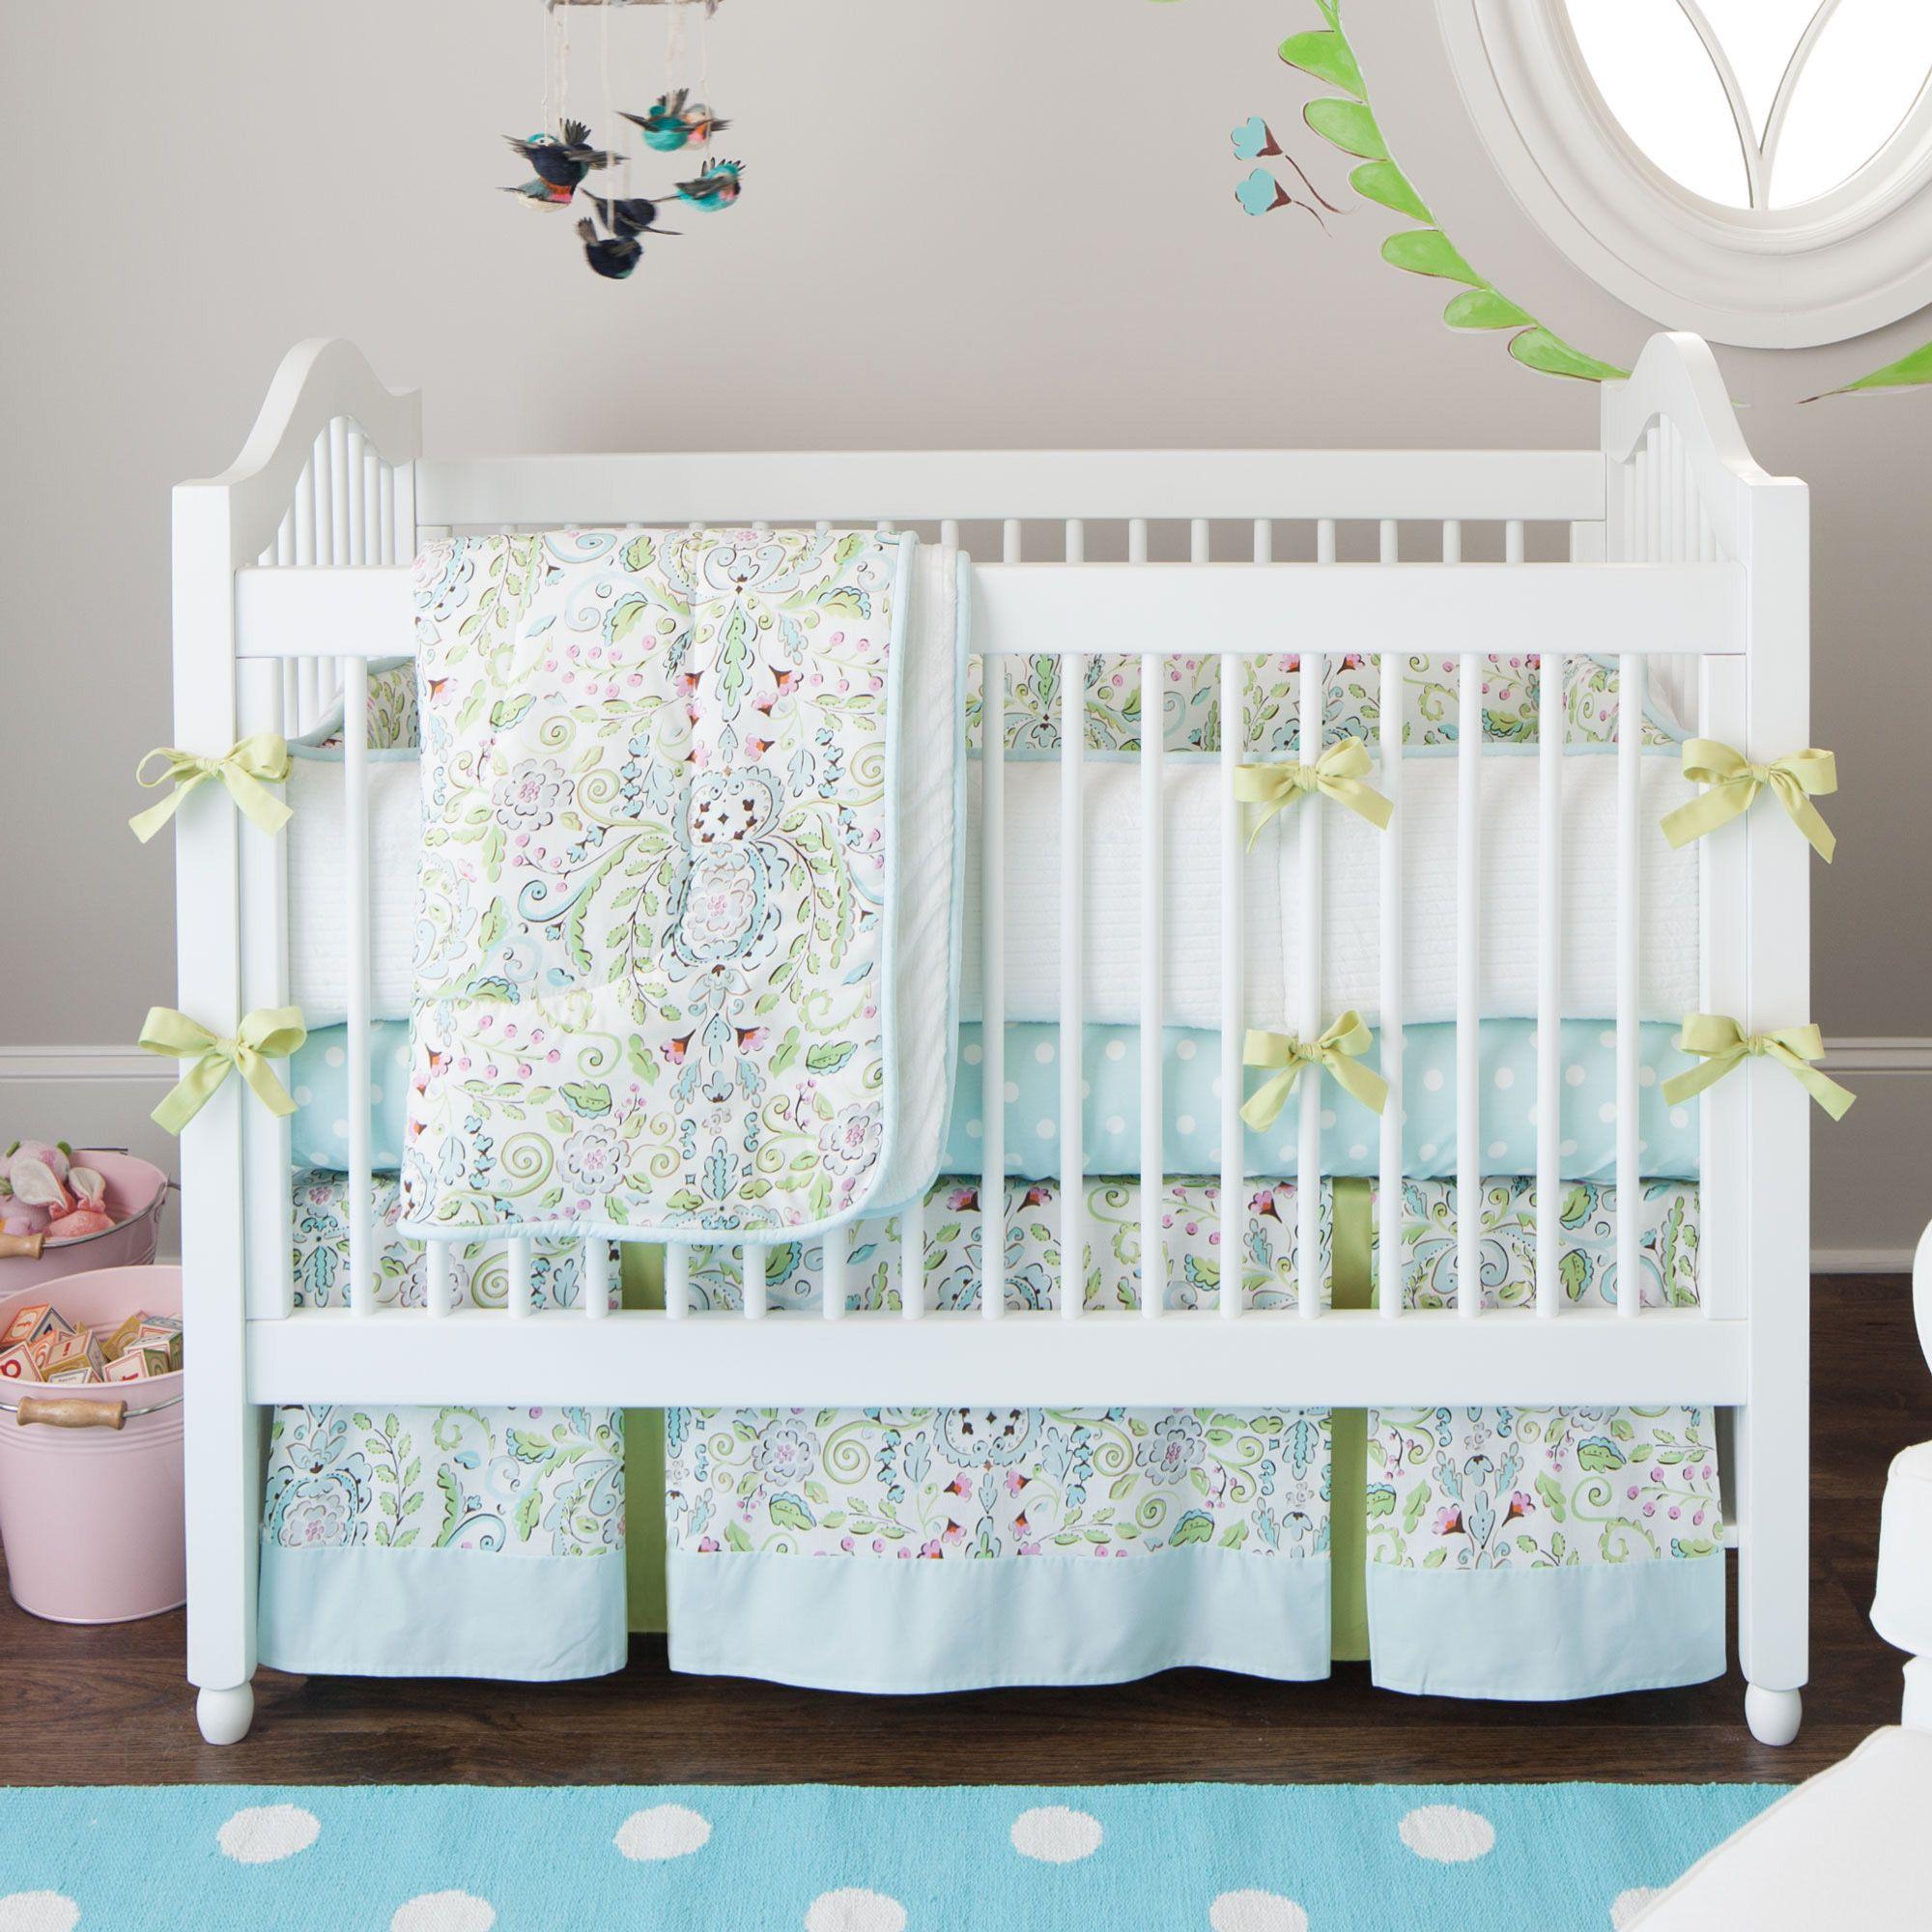 Best Bebe Jardin Baby Crib Bedding Baby Girl Crib Bedding 400 x 300